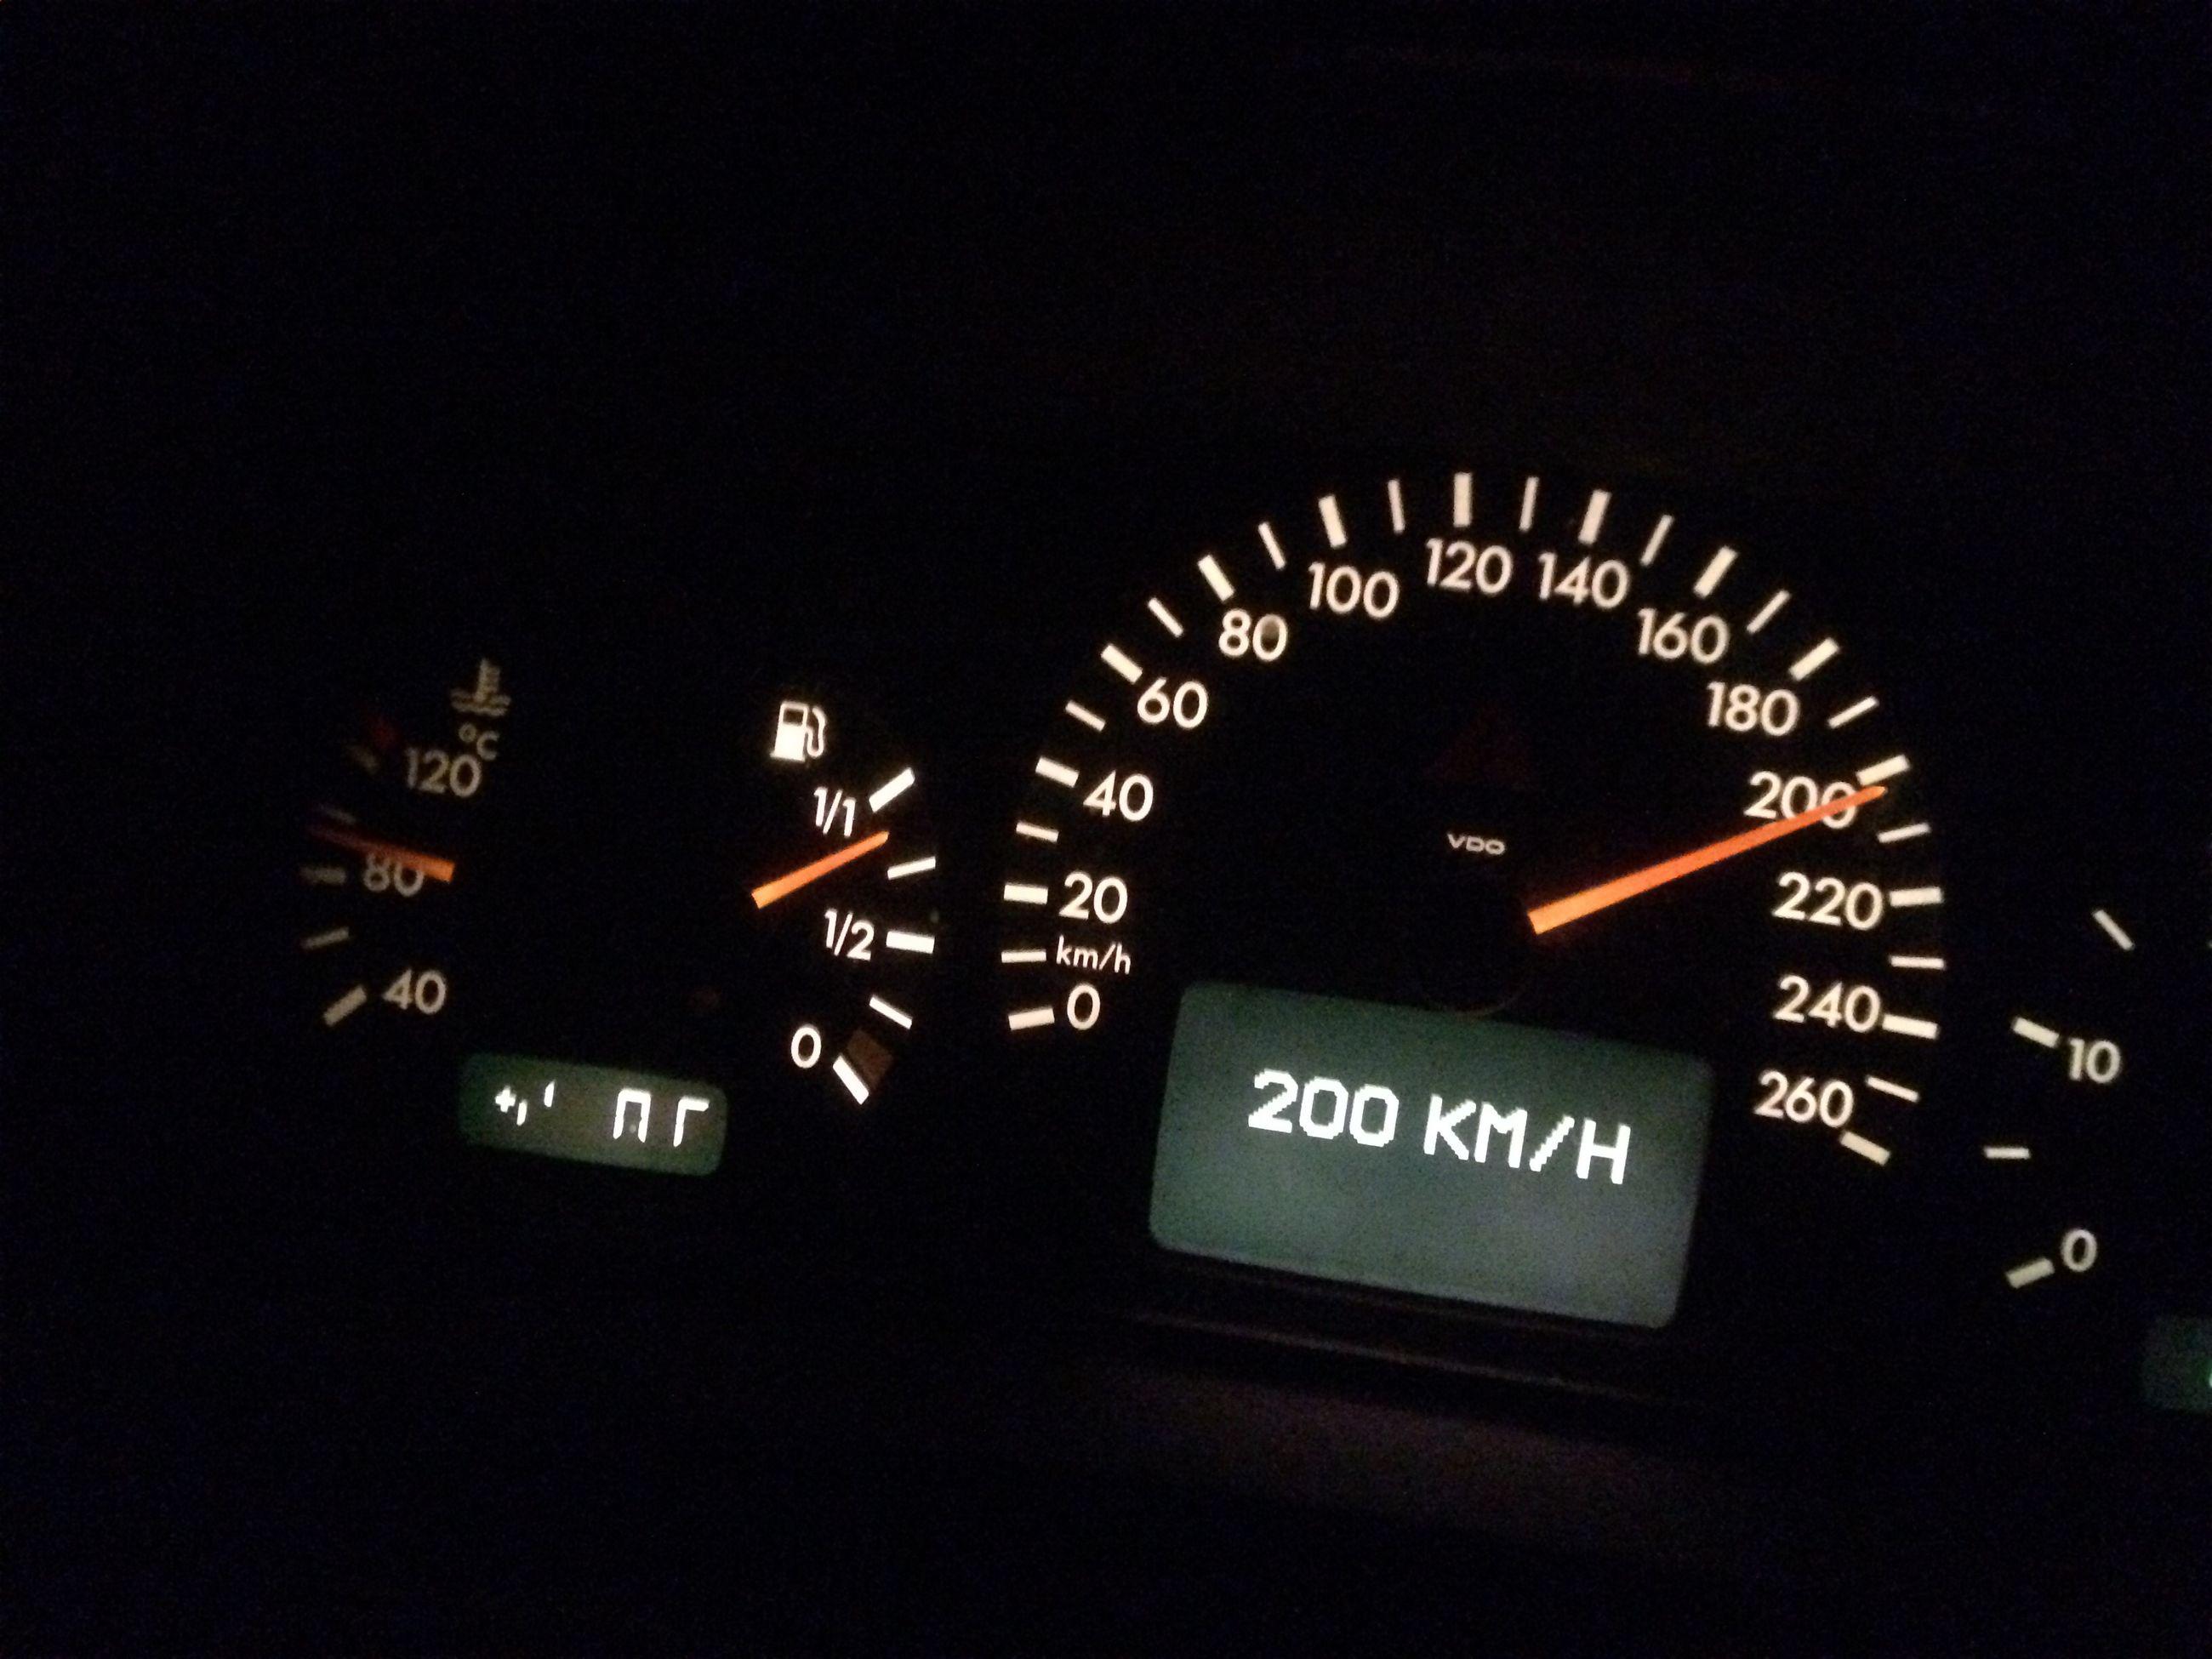 speedometer, night, illuminated, transportation, no people, car, dashboard, mode of transport, black background, land vehicle, gauge, control panel, close-up, technology, indoors